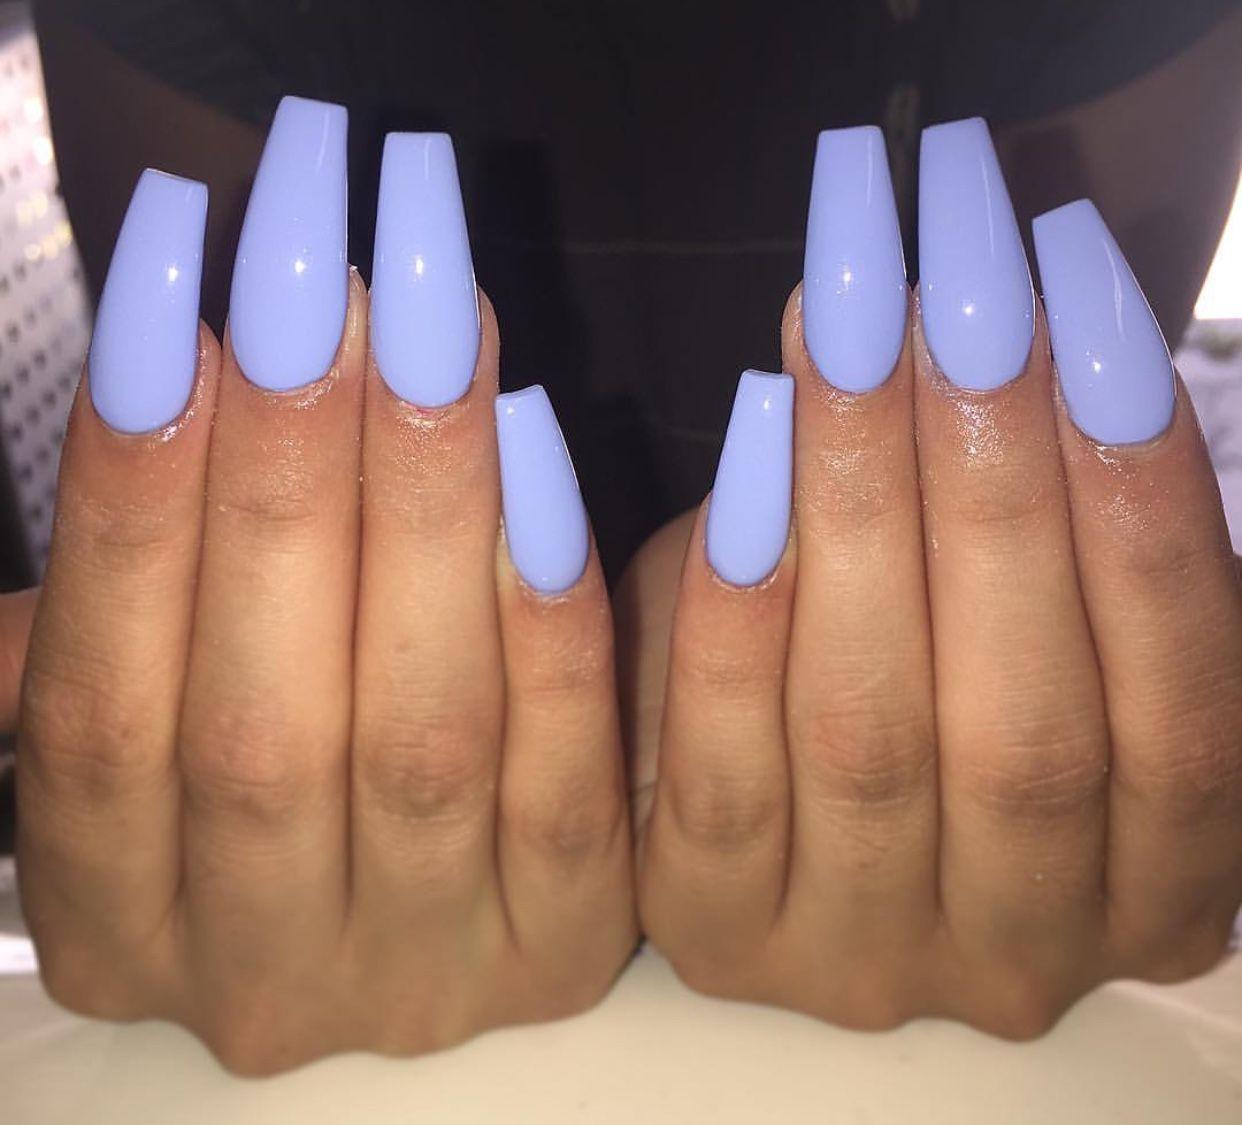 Check out @guapshawty ❤ | nails | Pinterest